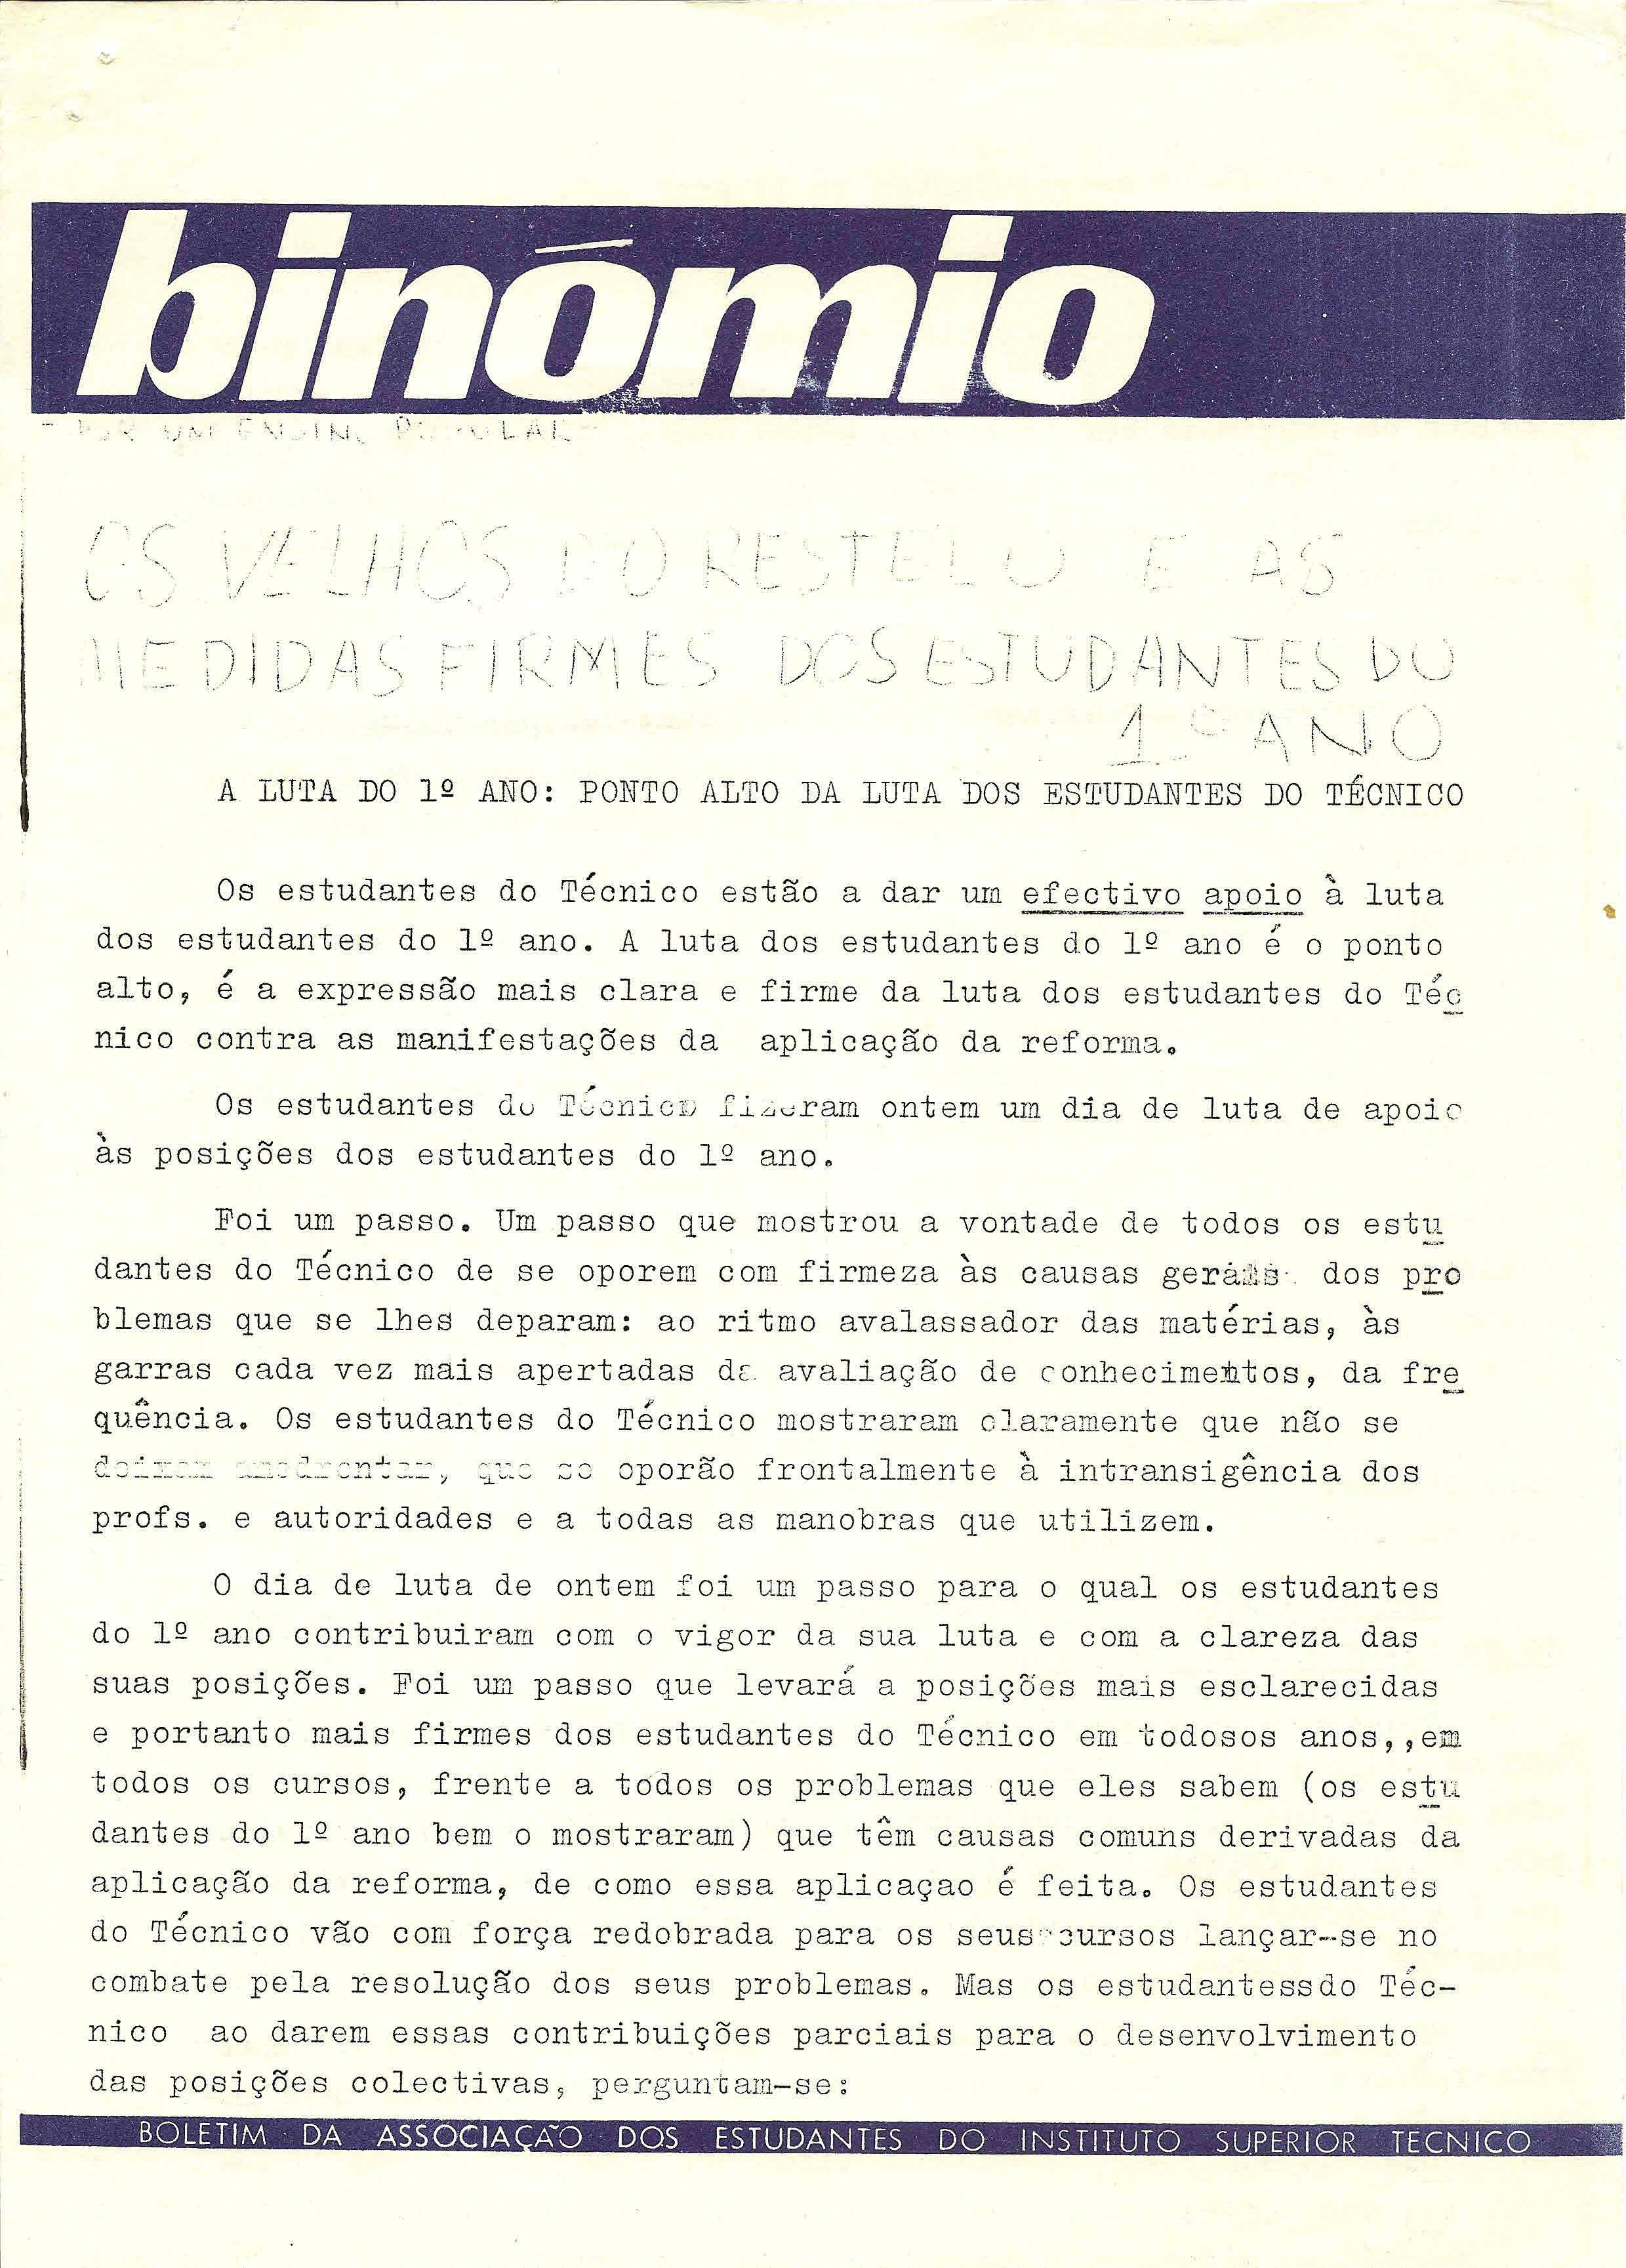 Copy of Binómio – A luta do 1º ano